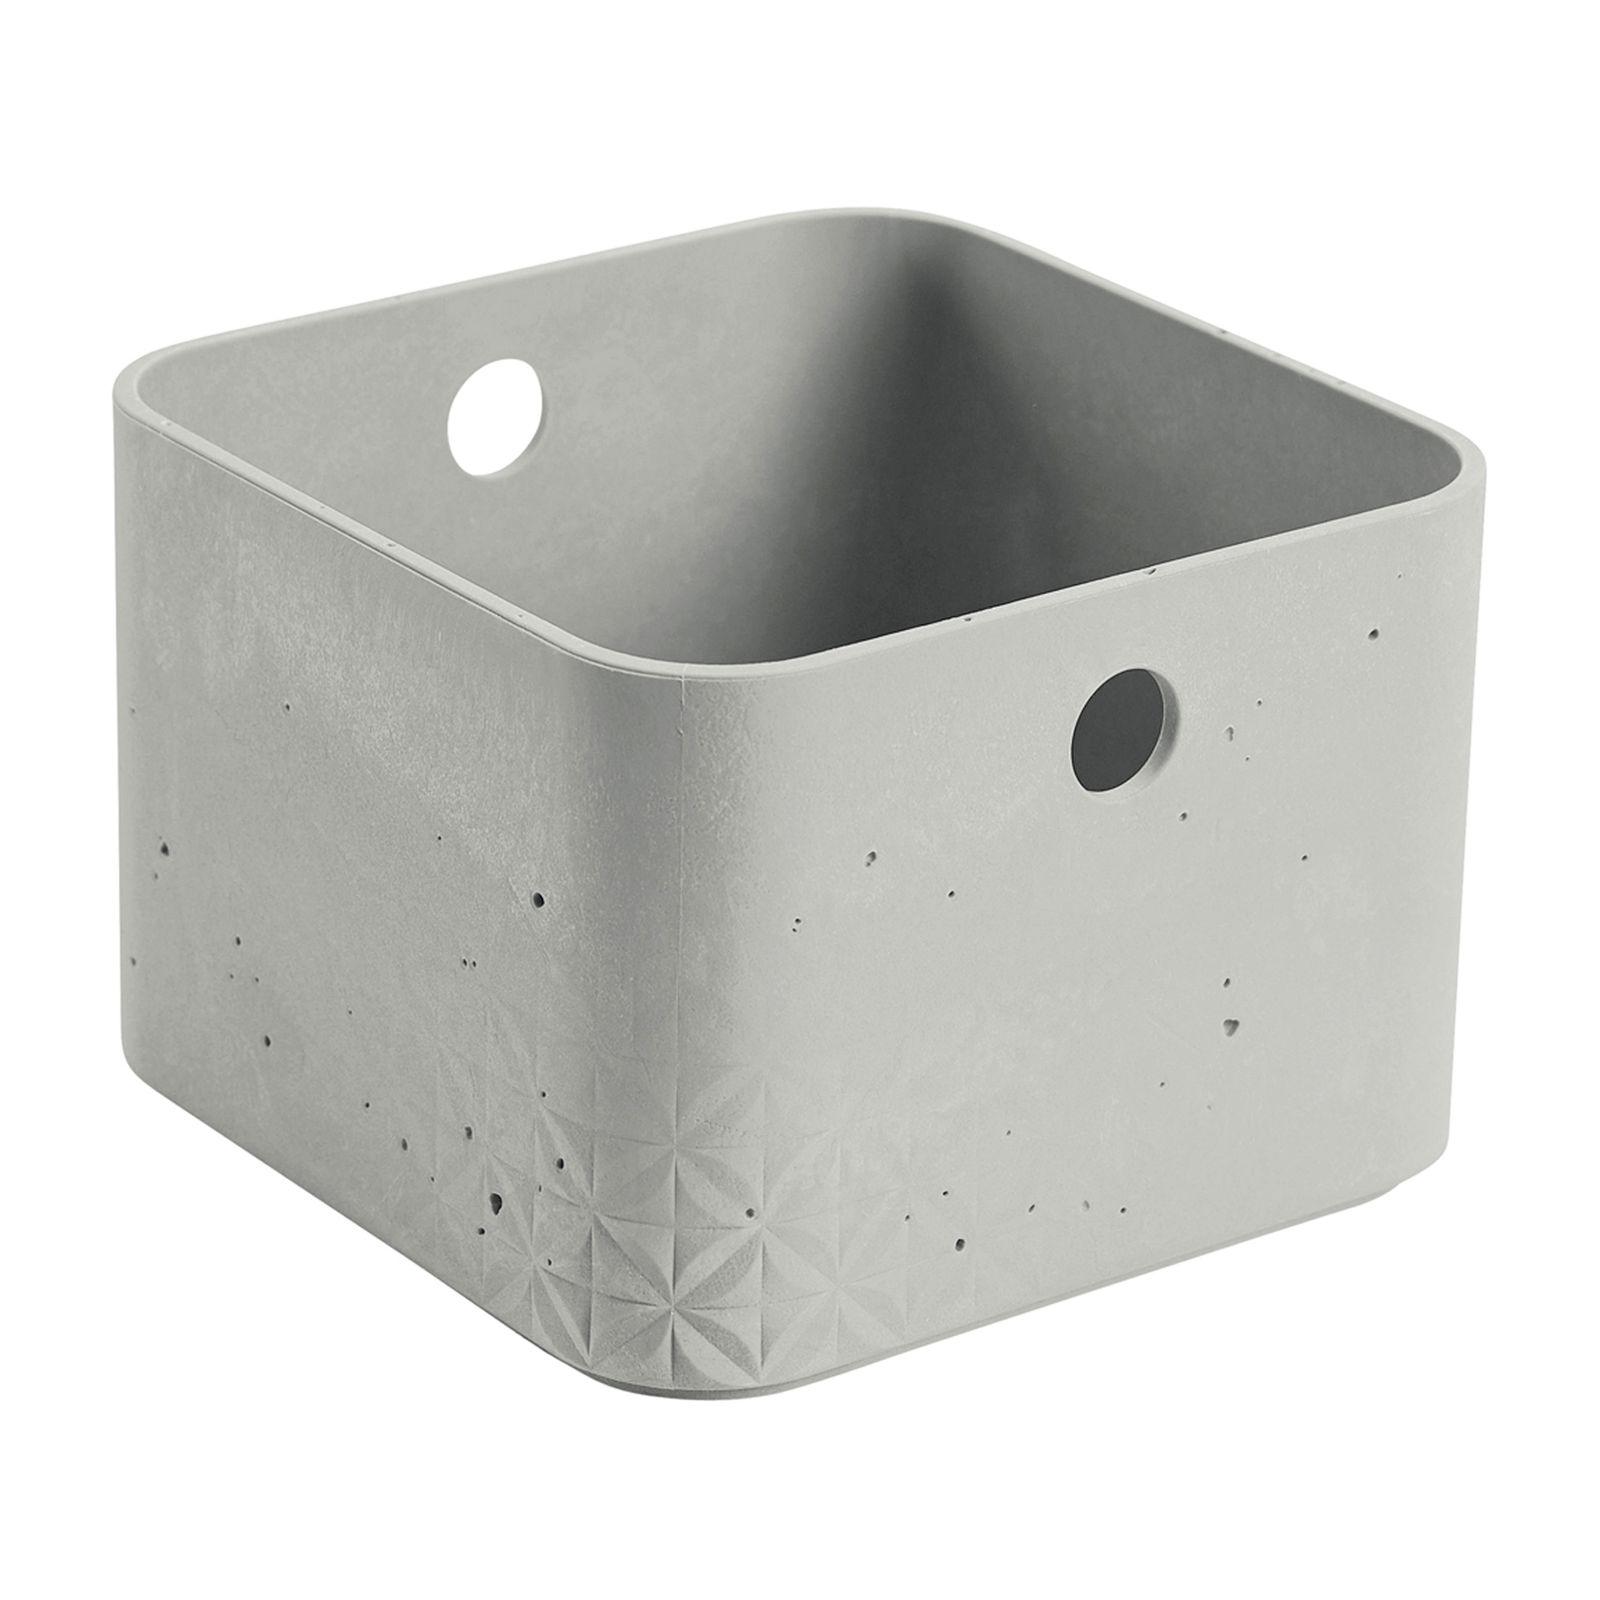 Caja cuadrada 3 l Beton gris claro CURVER